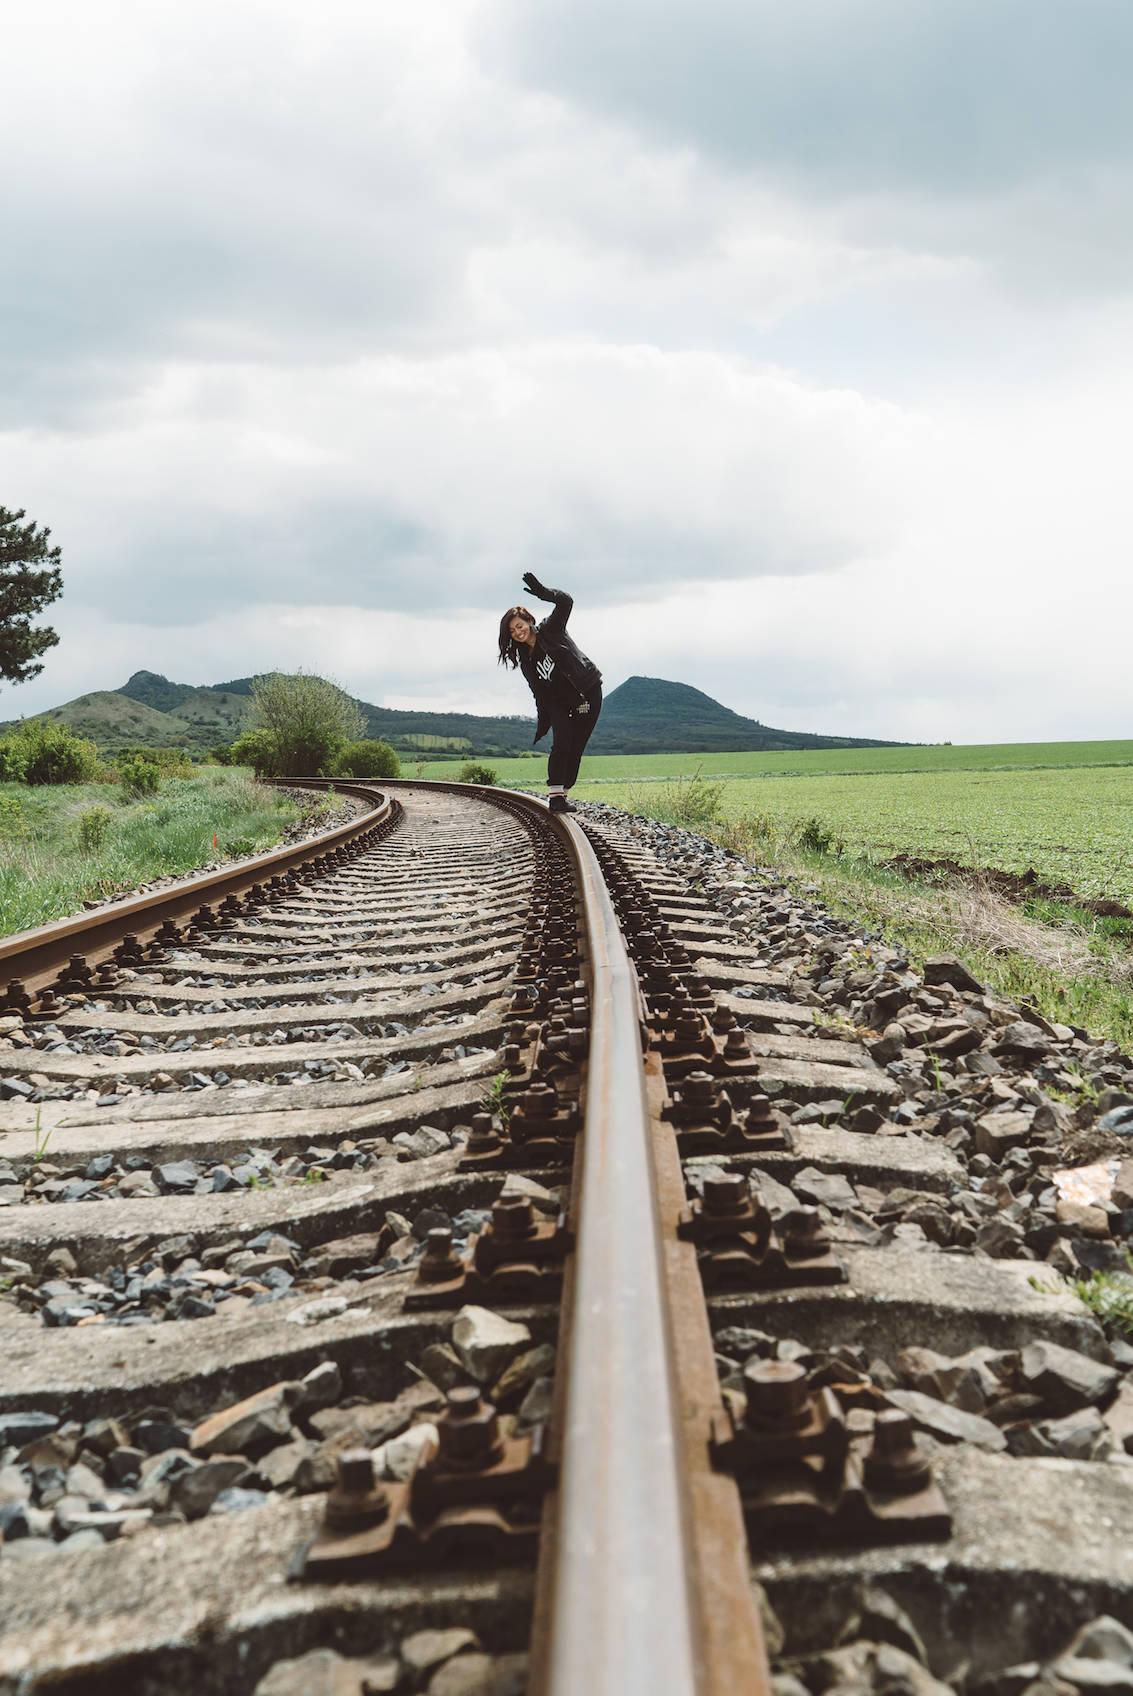 Train Tracks Bohemian Switzerland National Park